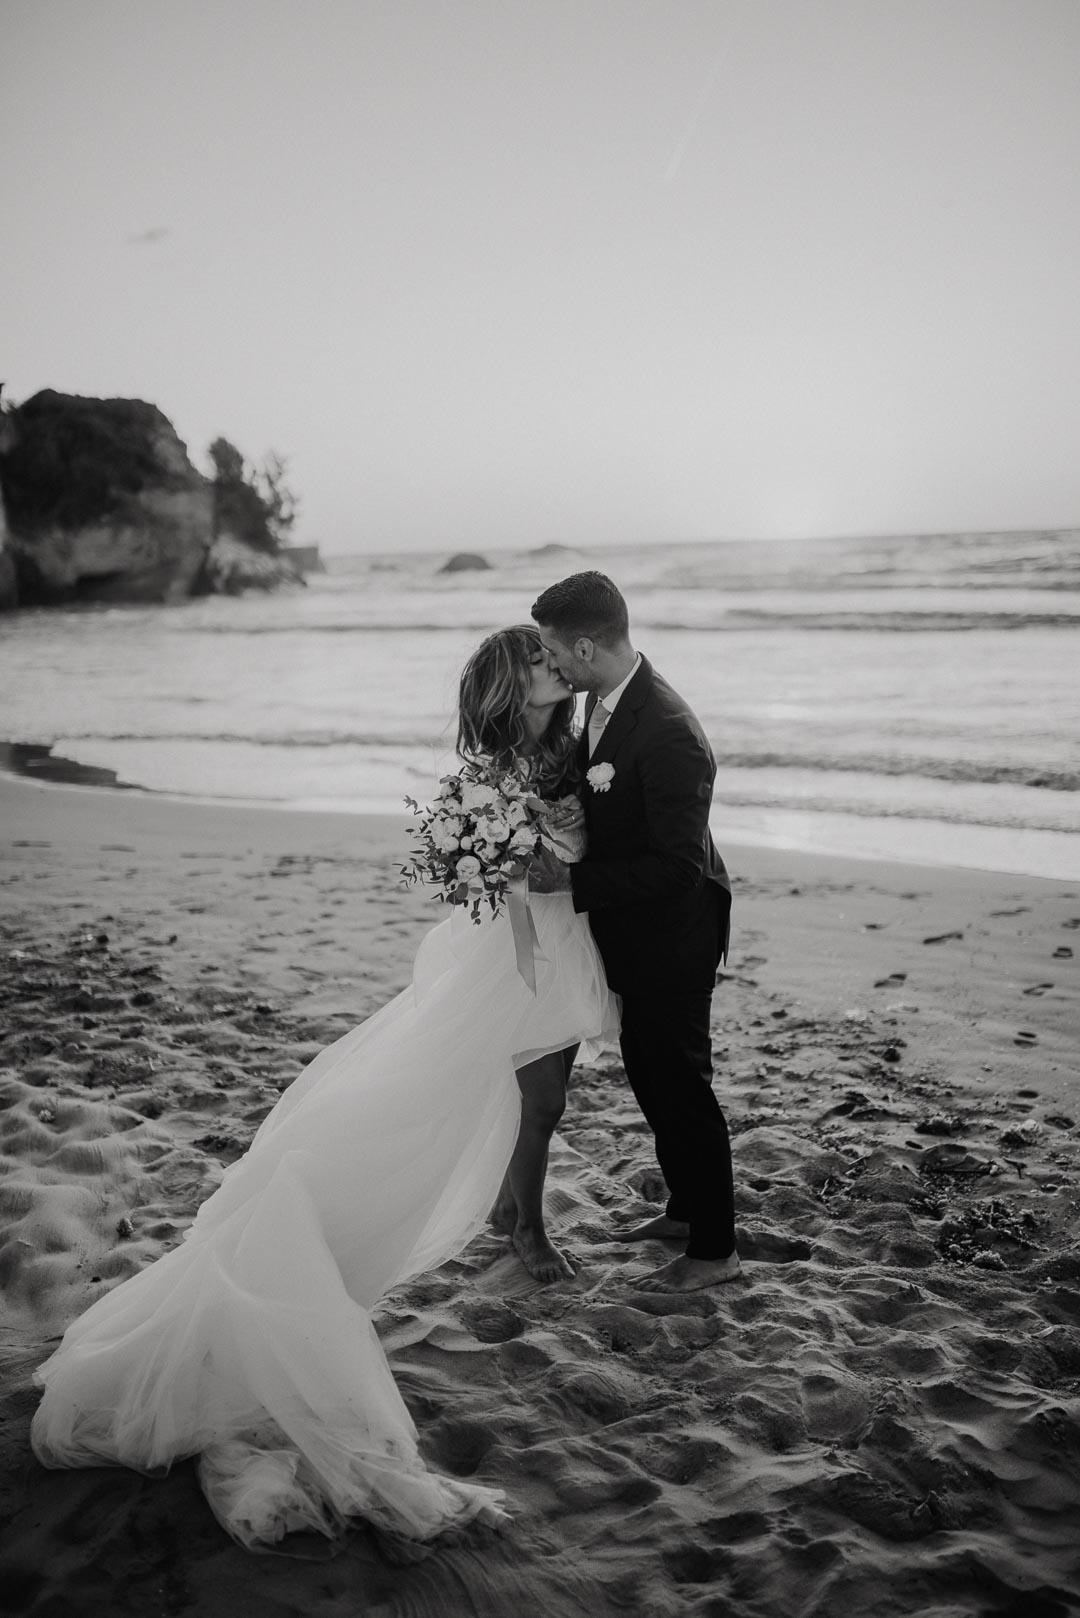 wedding-photographer-destination-fineart-bespoke-reportage-napoli-nabilah-vivianeizzo-spazio46-137